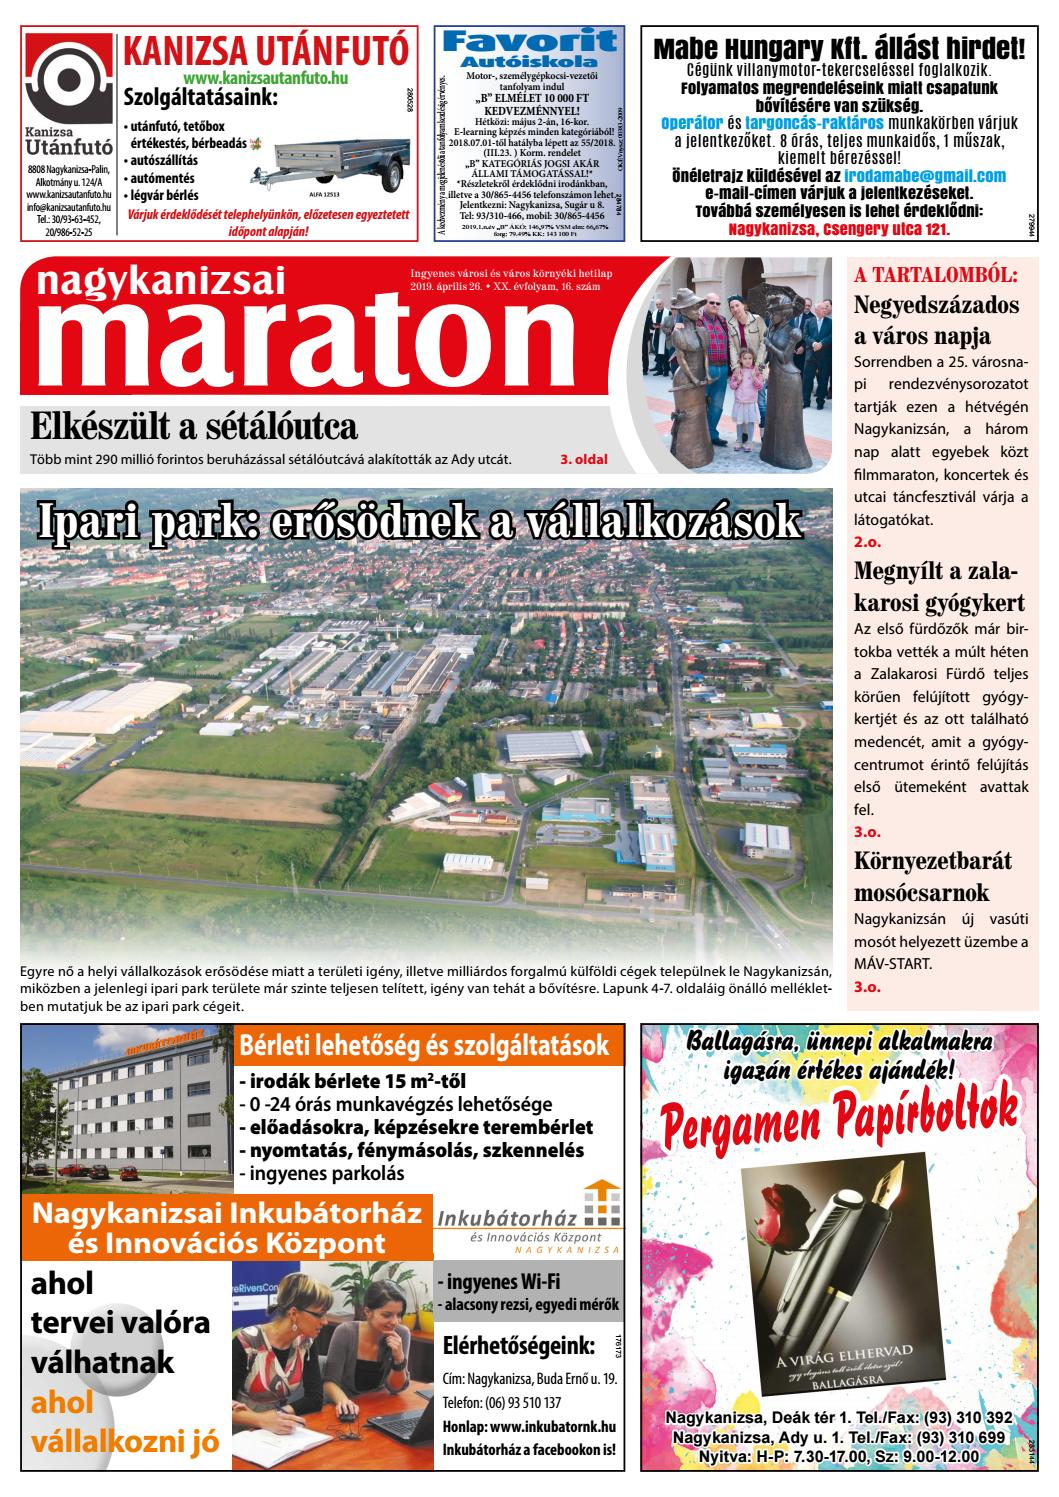 c8936346f4 Nagykanizsai Maraton - 2019. 04. 26. by Maraton Lapcsoport Kft. - issuu